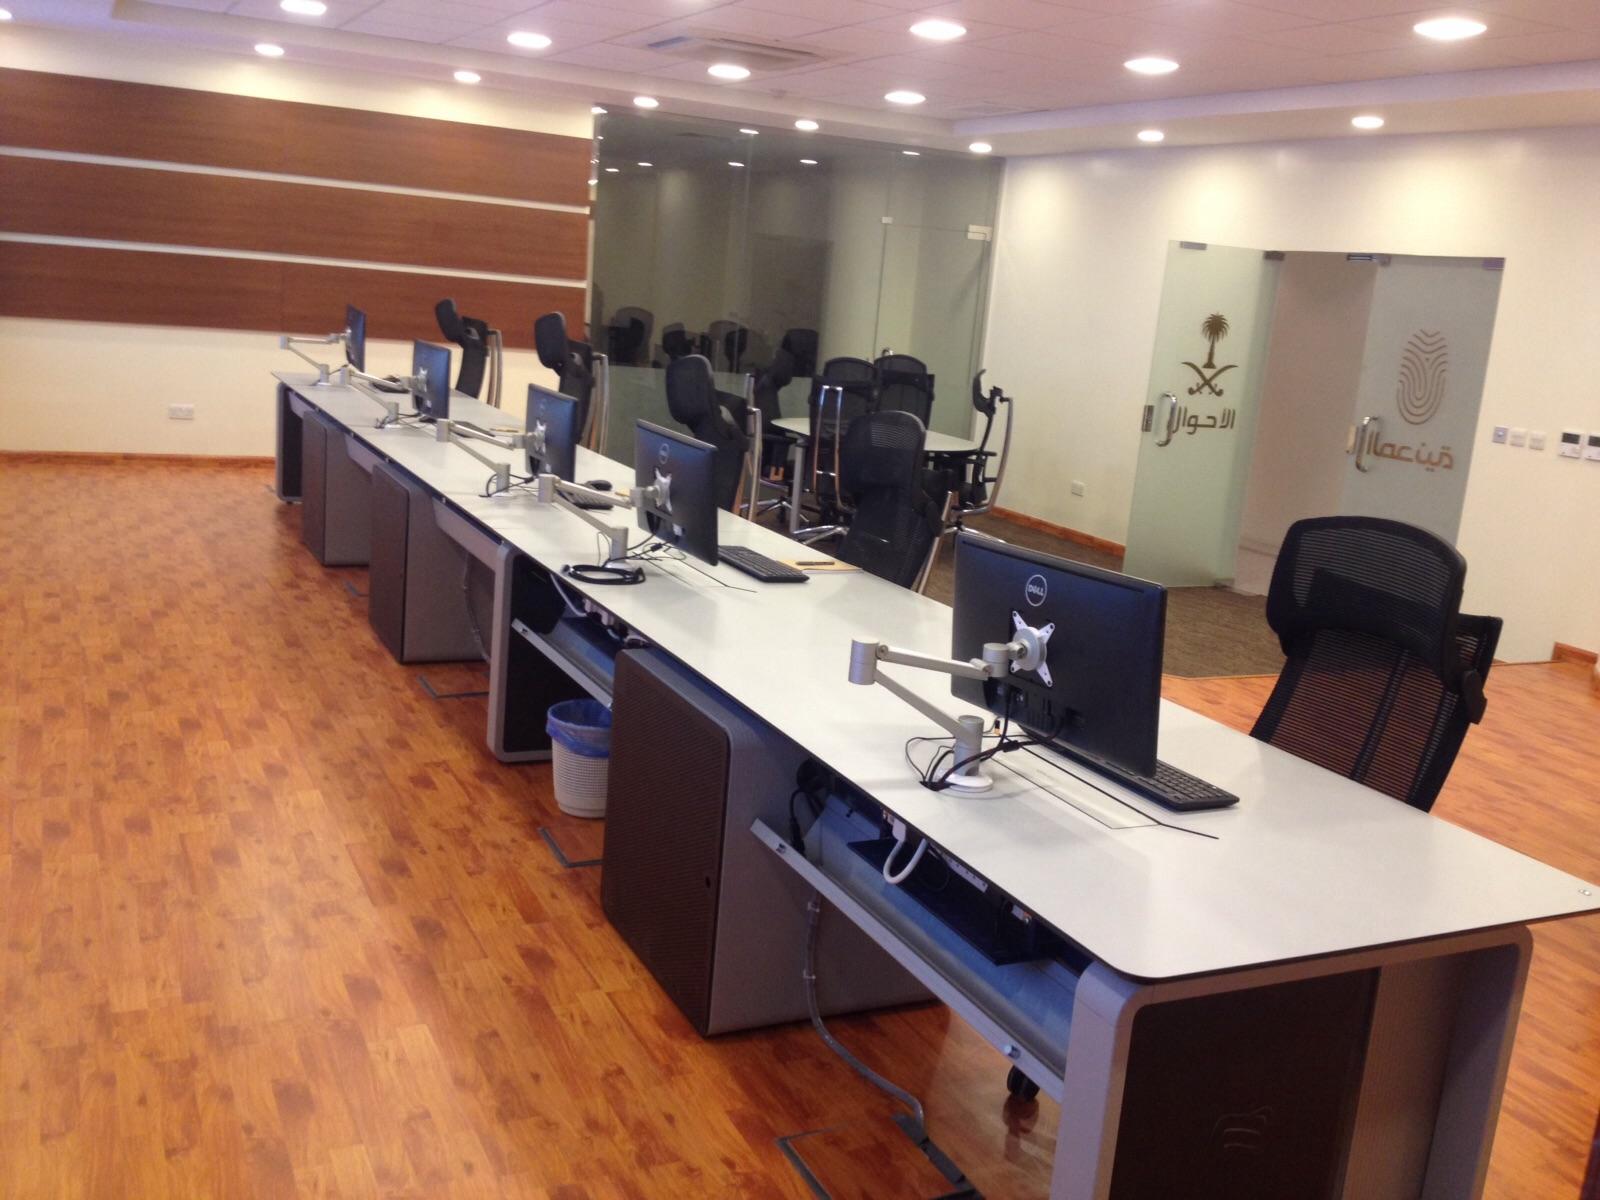 Control Room Furniture Saudi Arabia